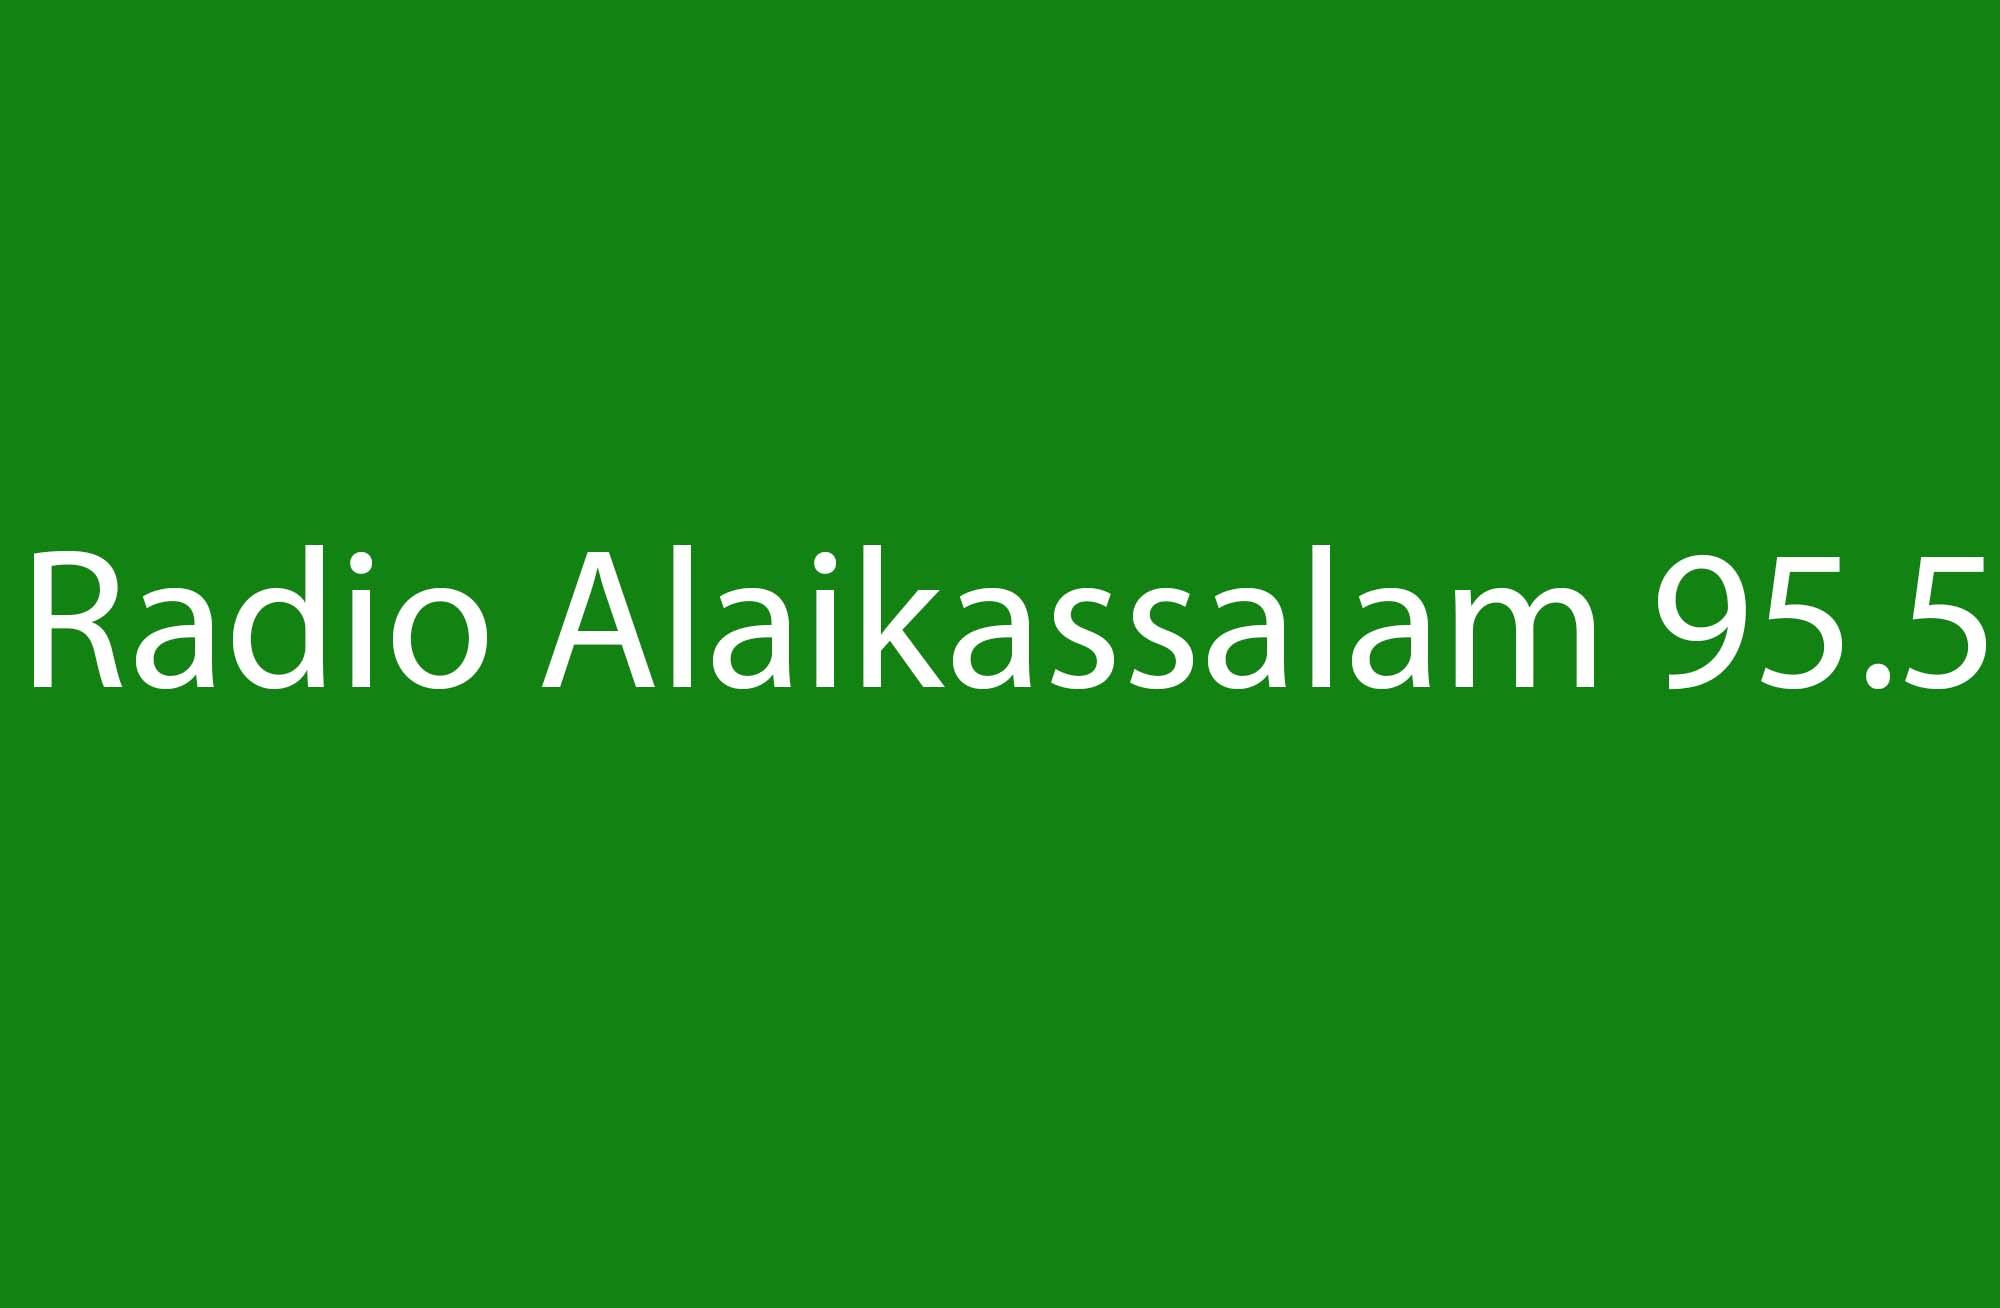 Radio Alaikassalam 95.5